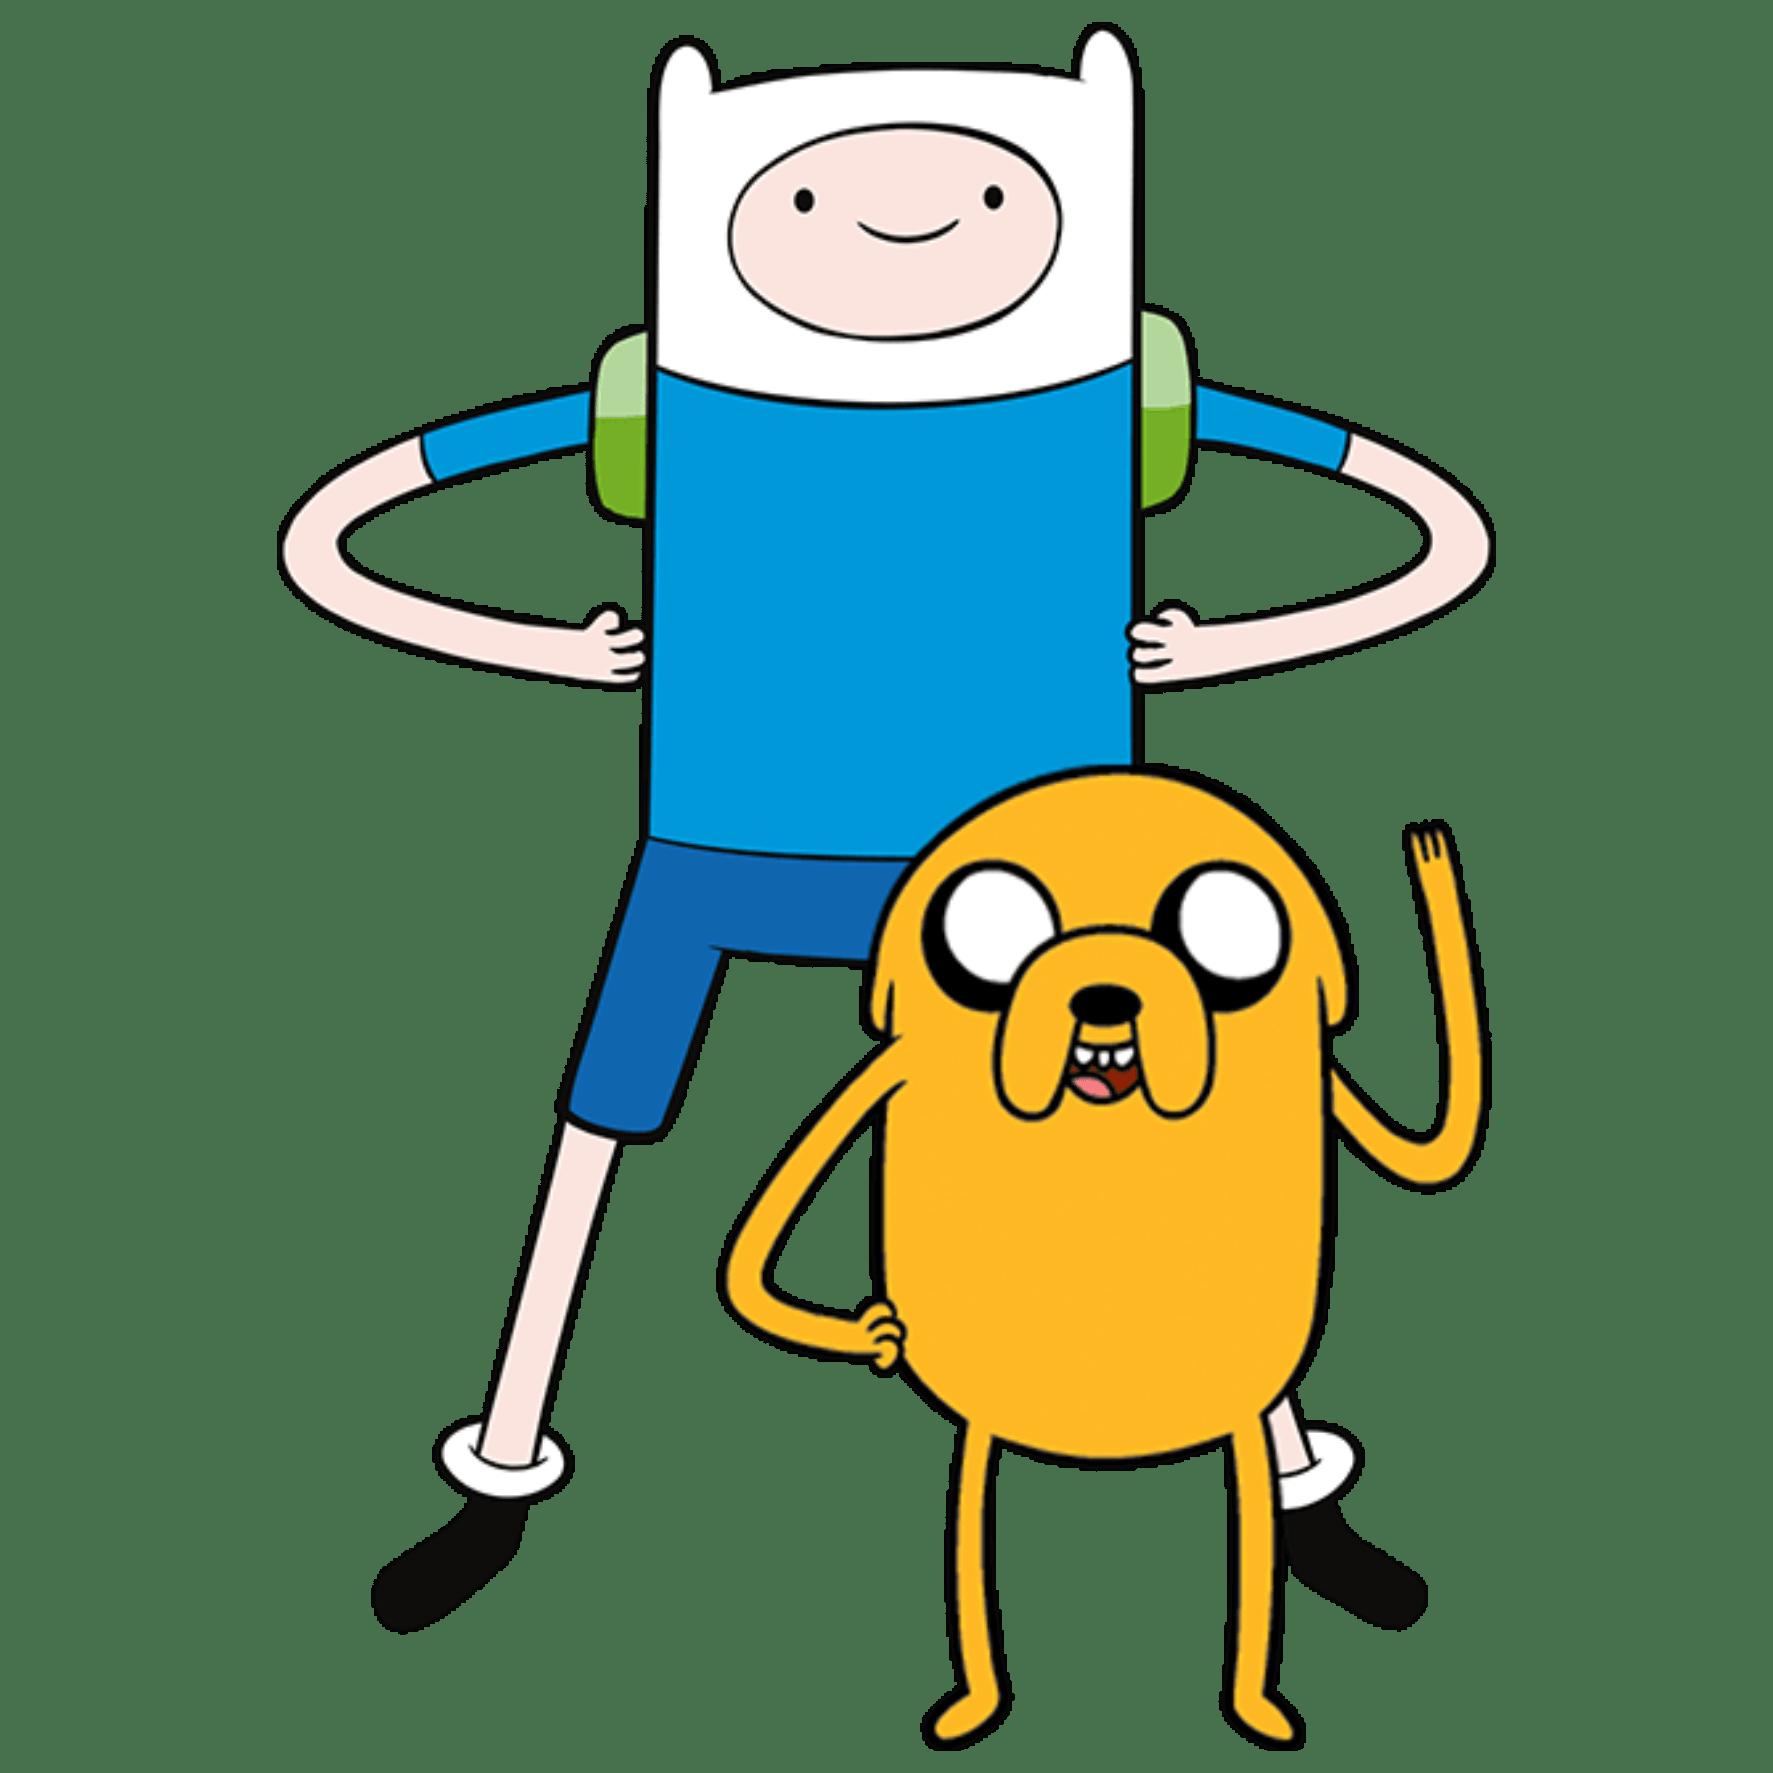 Spiksplinternieuw Cartoon Network vs Nickelodeon   Fantendo - Nintendo Fanon Wiki VO-51